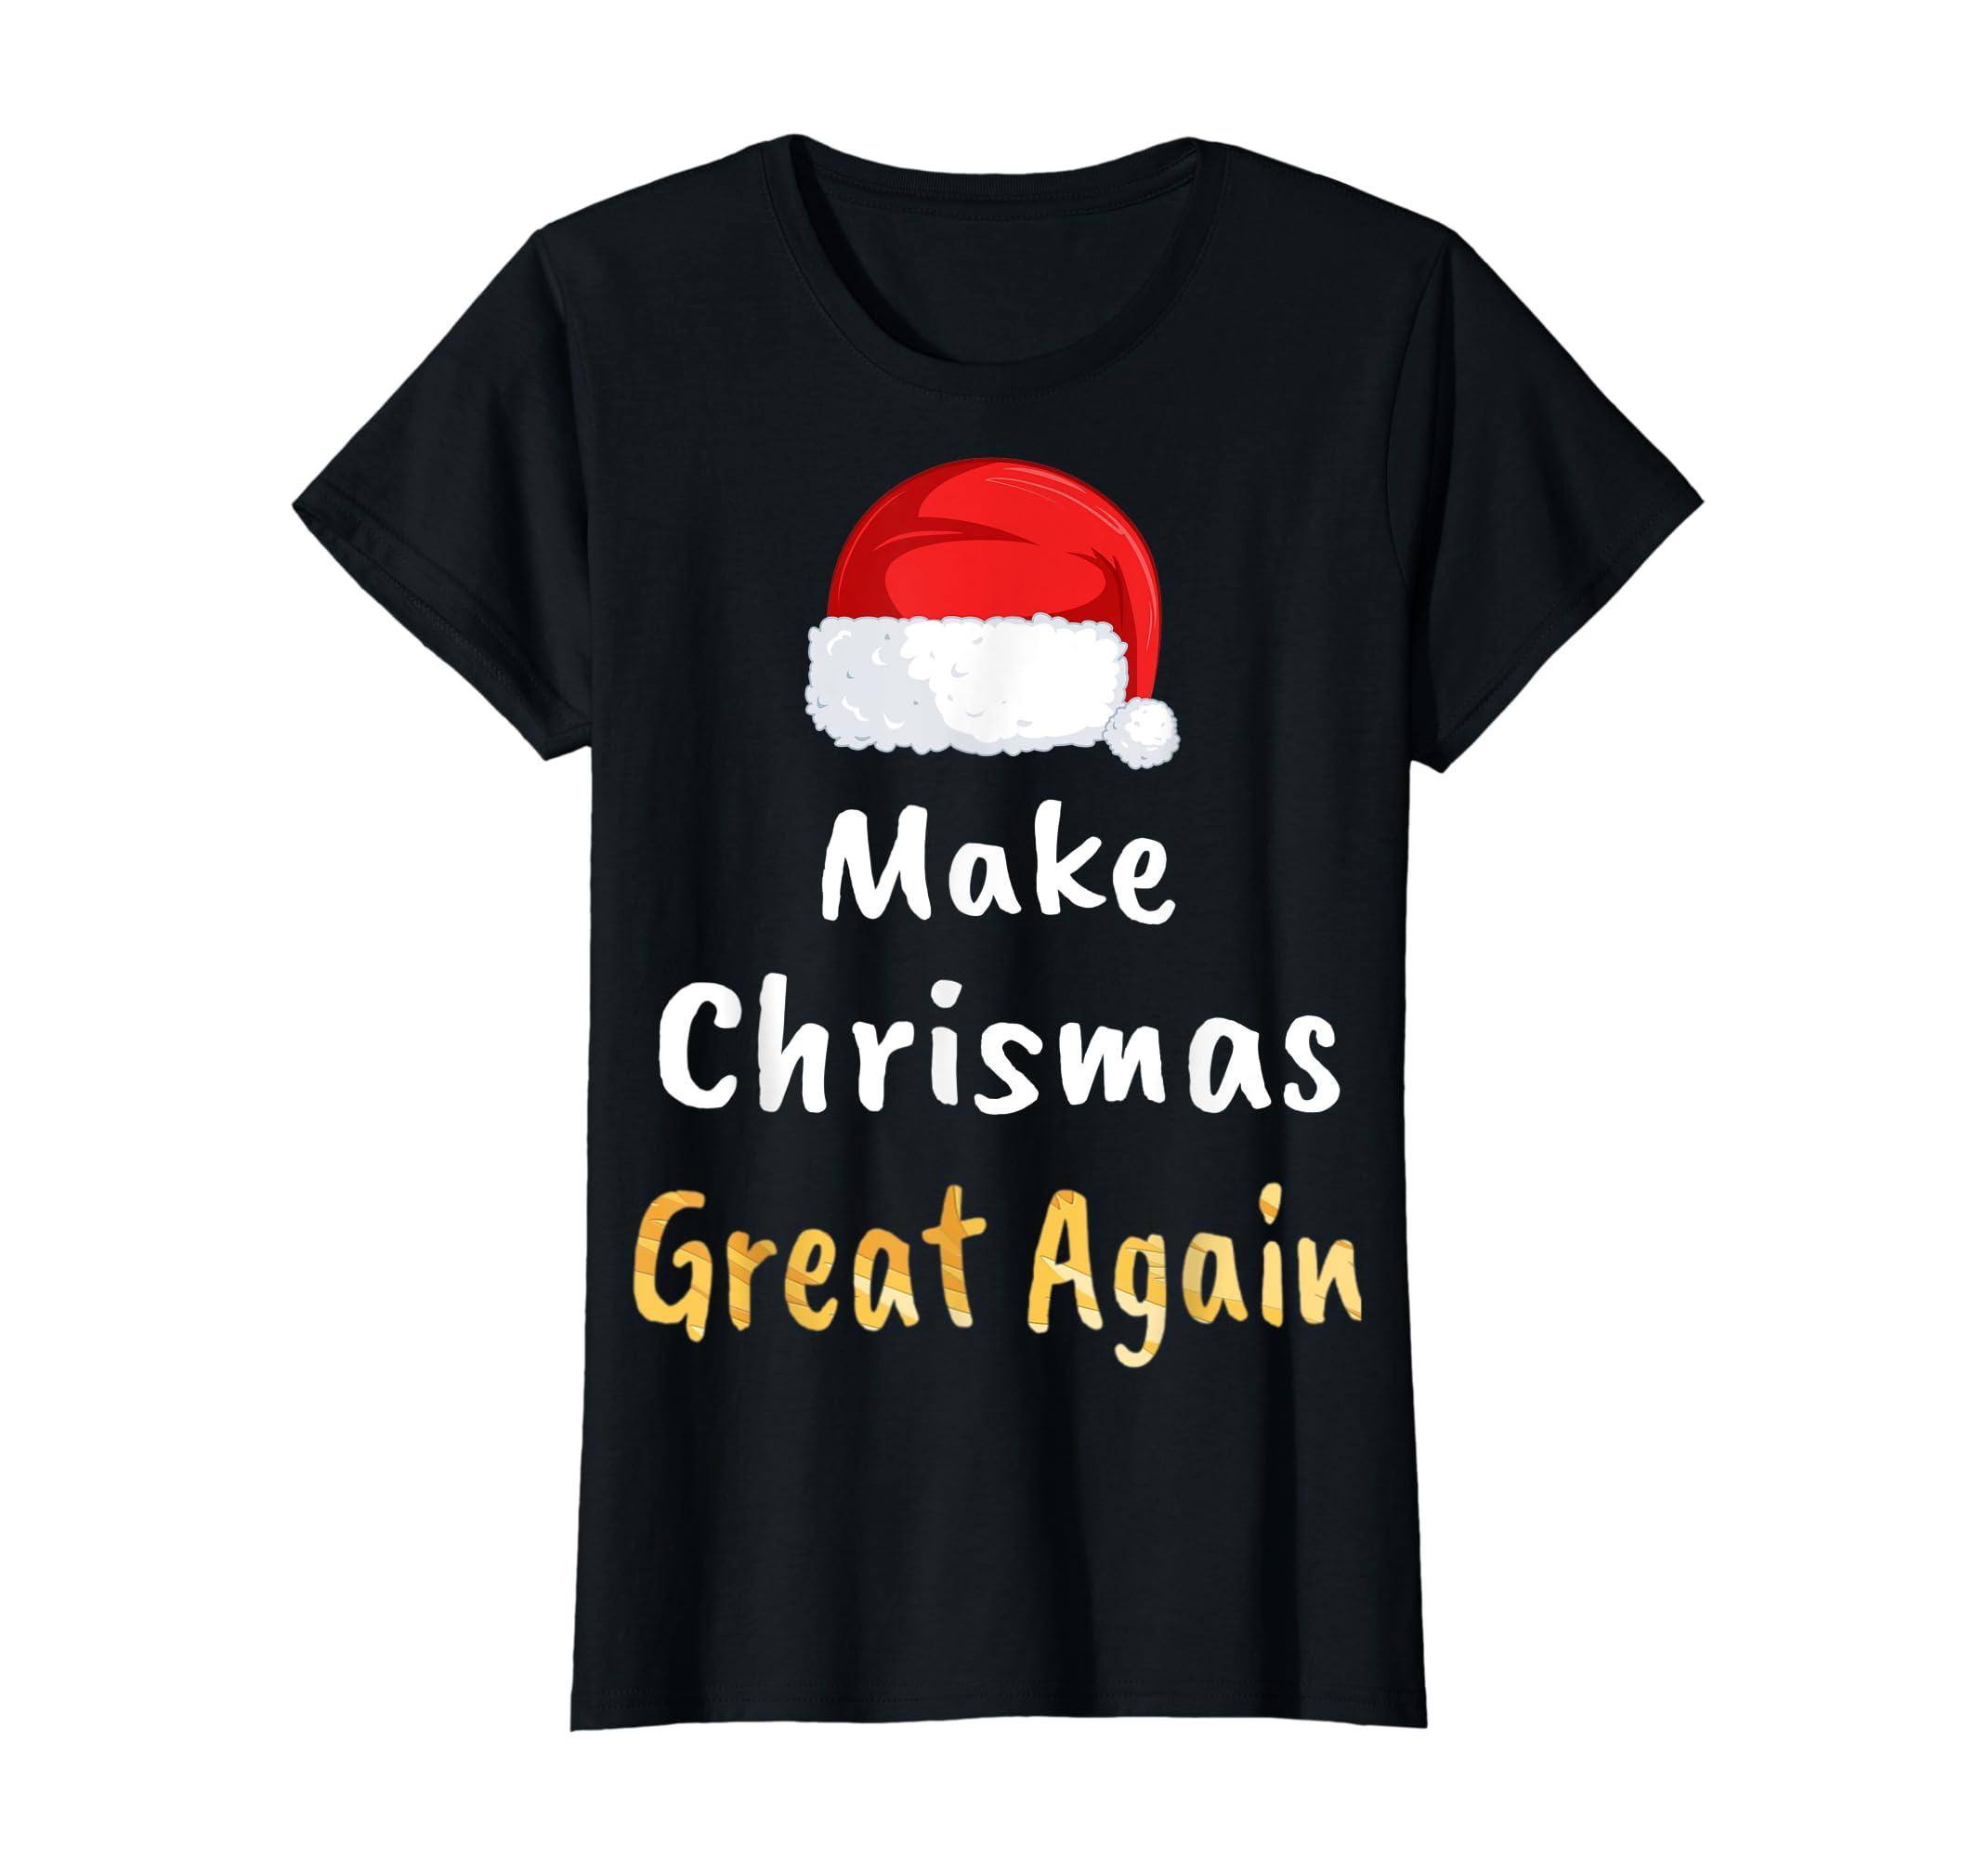 Awesome Make Christmas Great Again Trump Hat Xmas Gift T-Shirt-Women's T-Shirt-Black